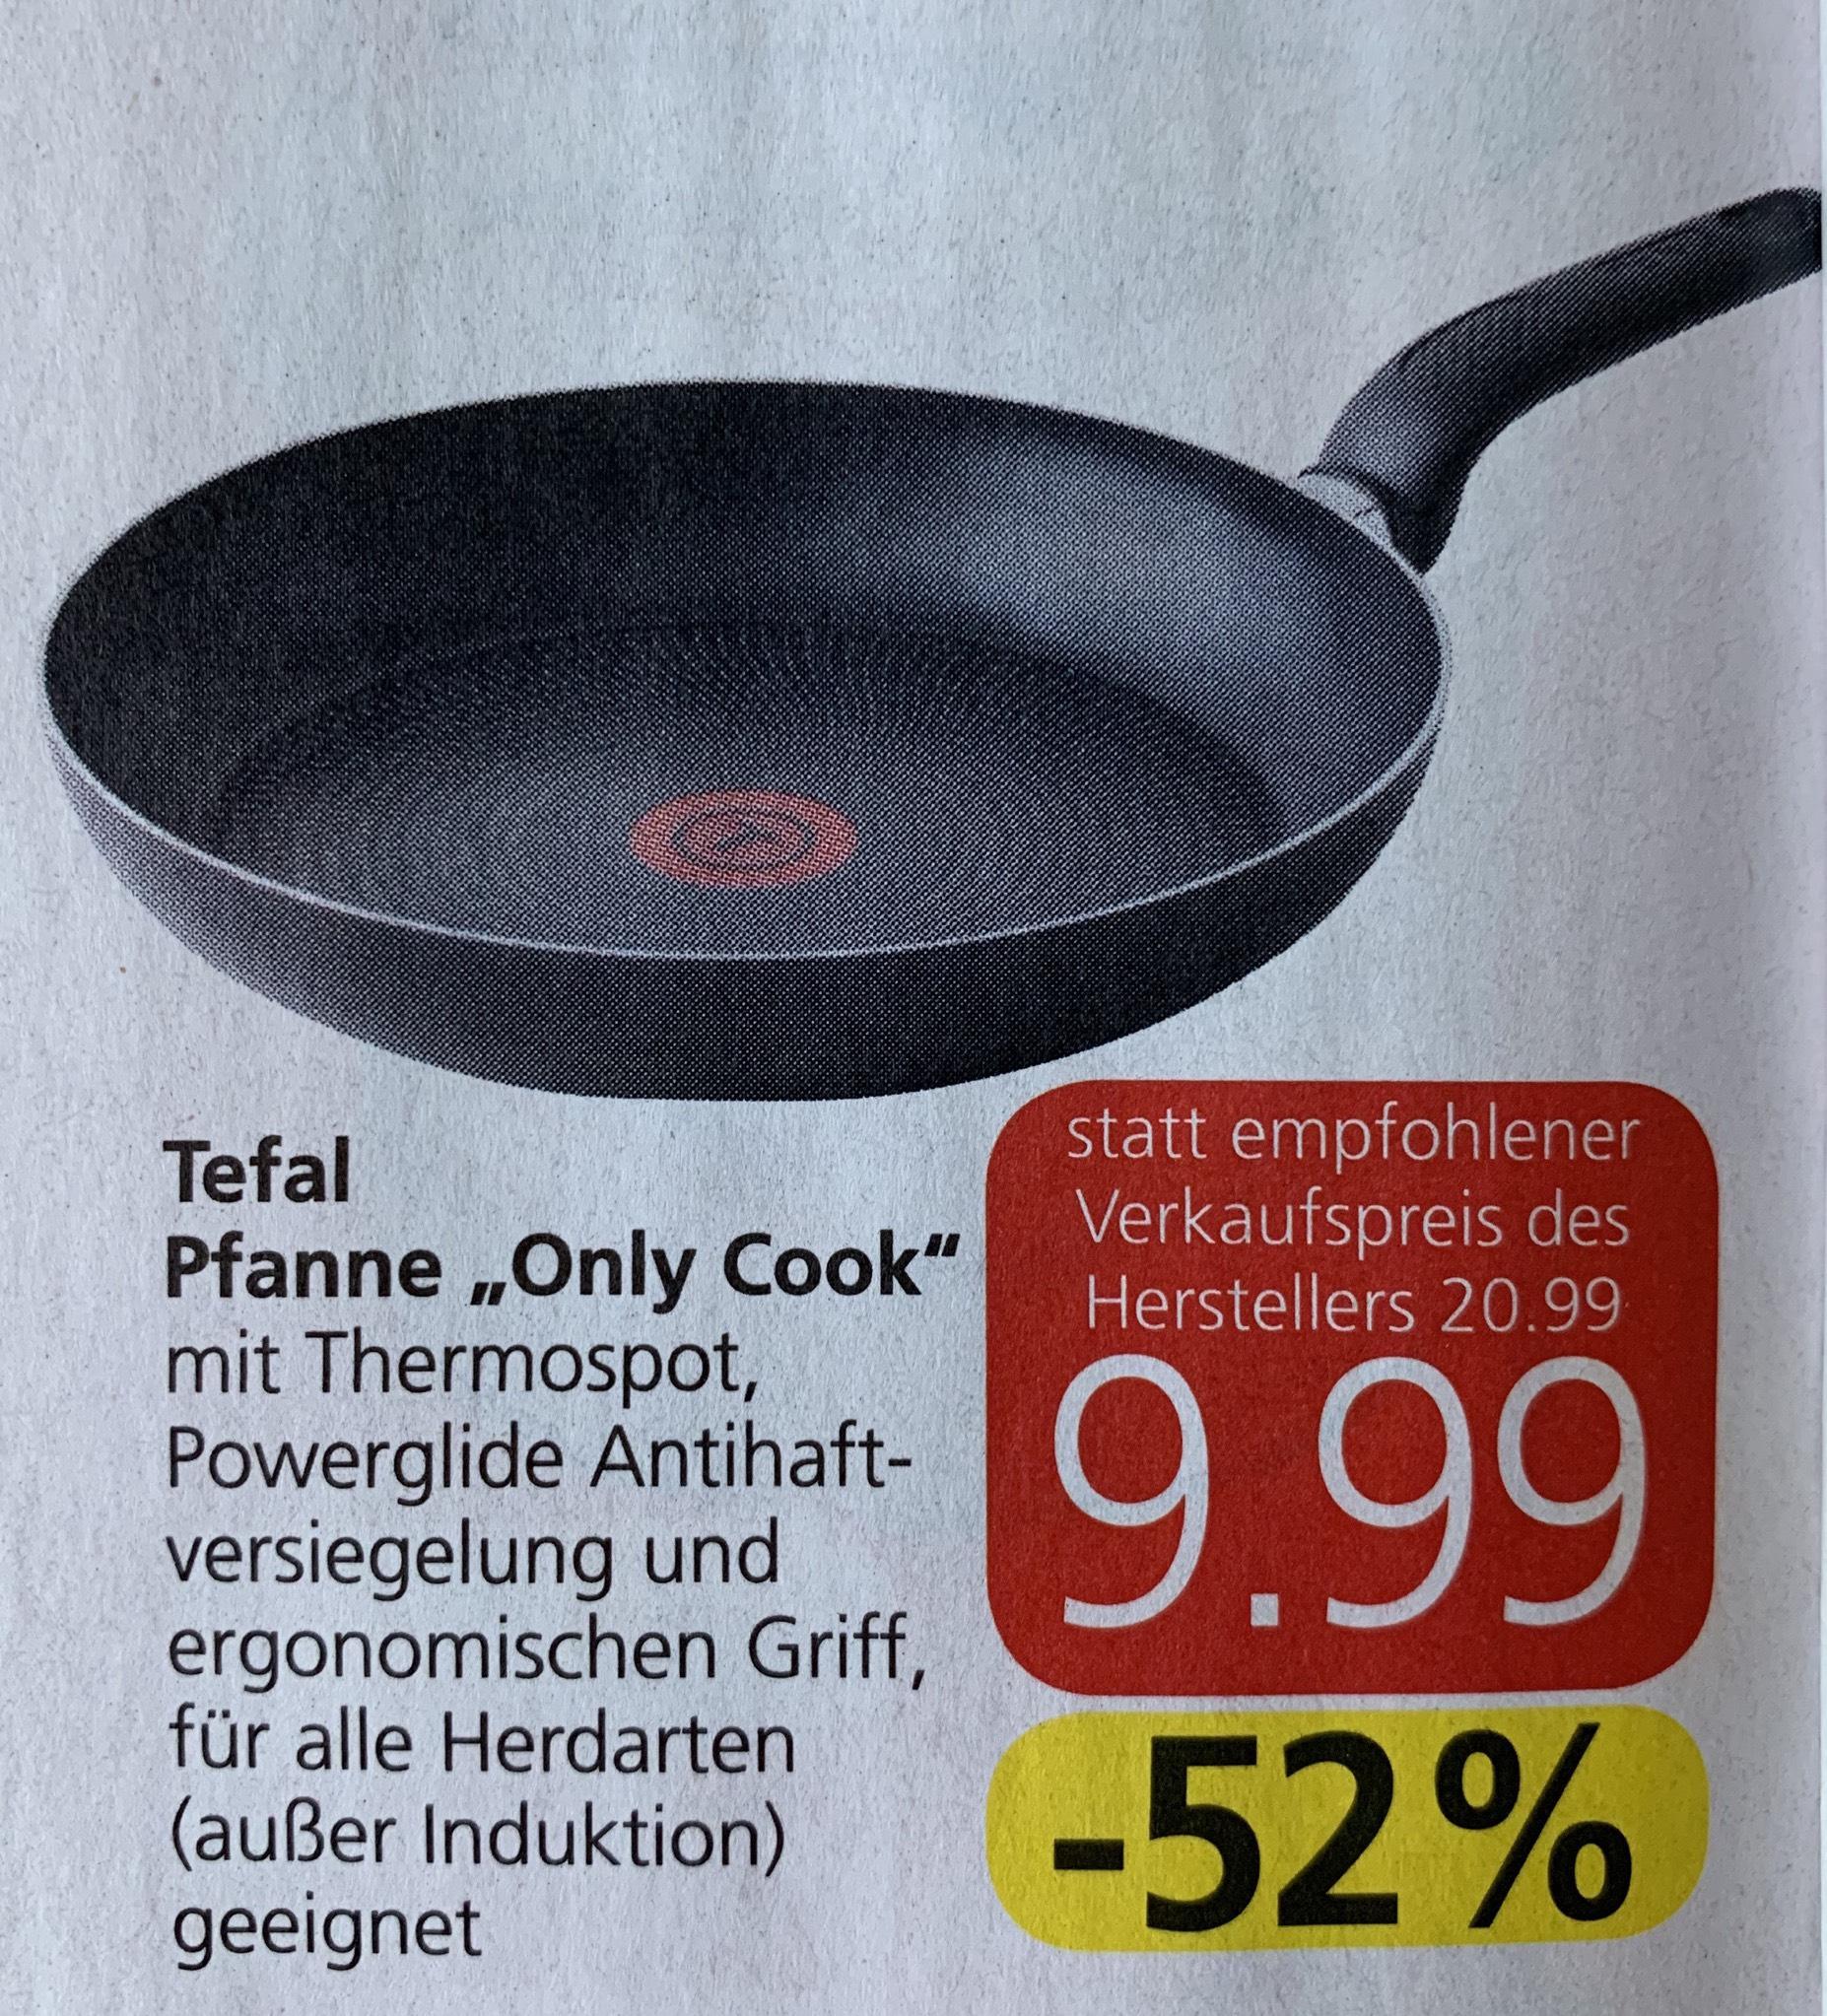 "Tefal Pfanne ""Only Cook"" - 28cm bei Spar um 9,99€"